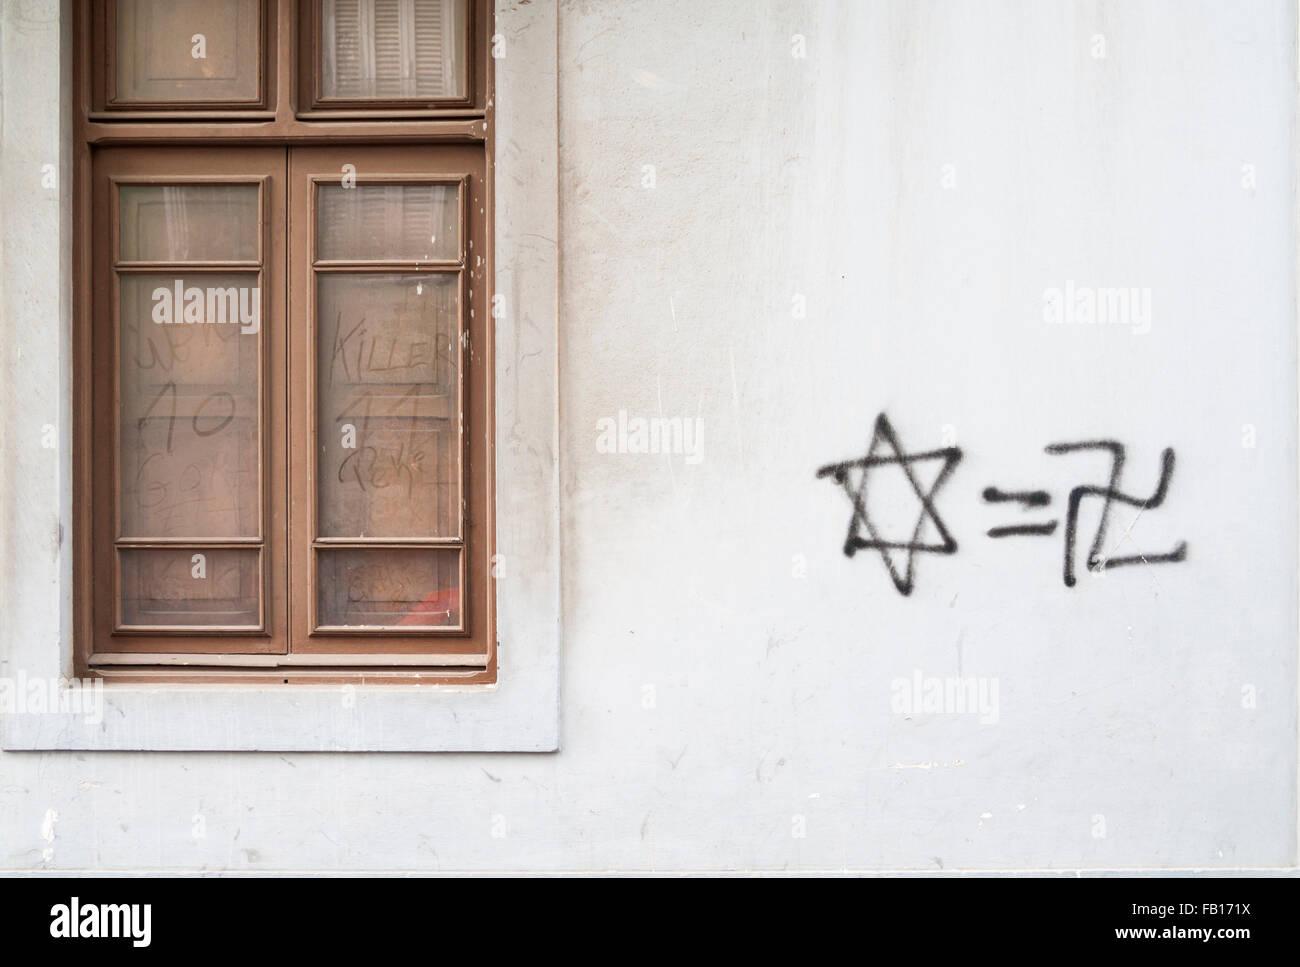 Anti semitic graffiti (Star of David and Swastika) on house wall. - Stock Image